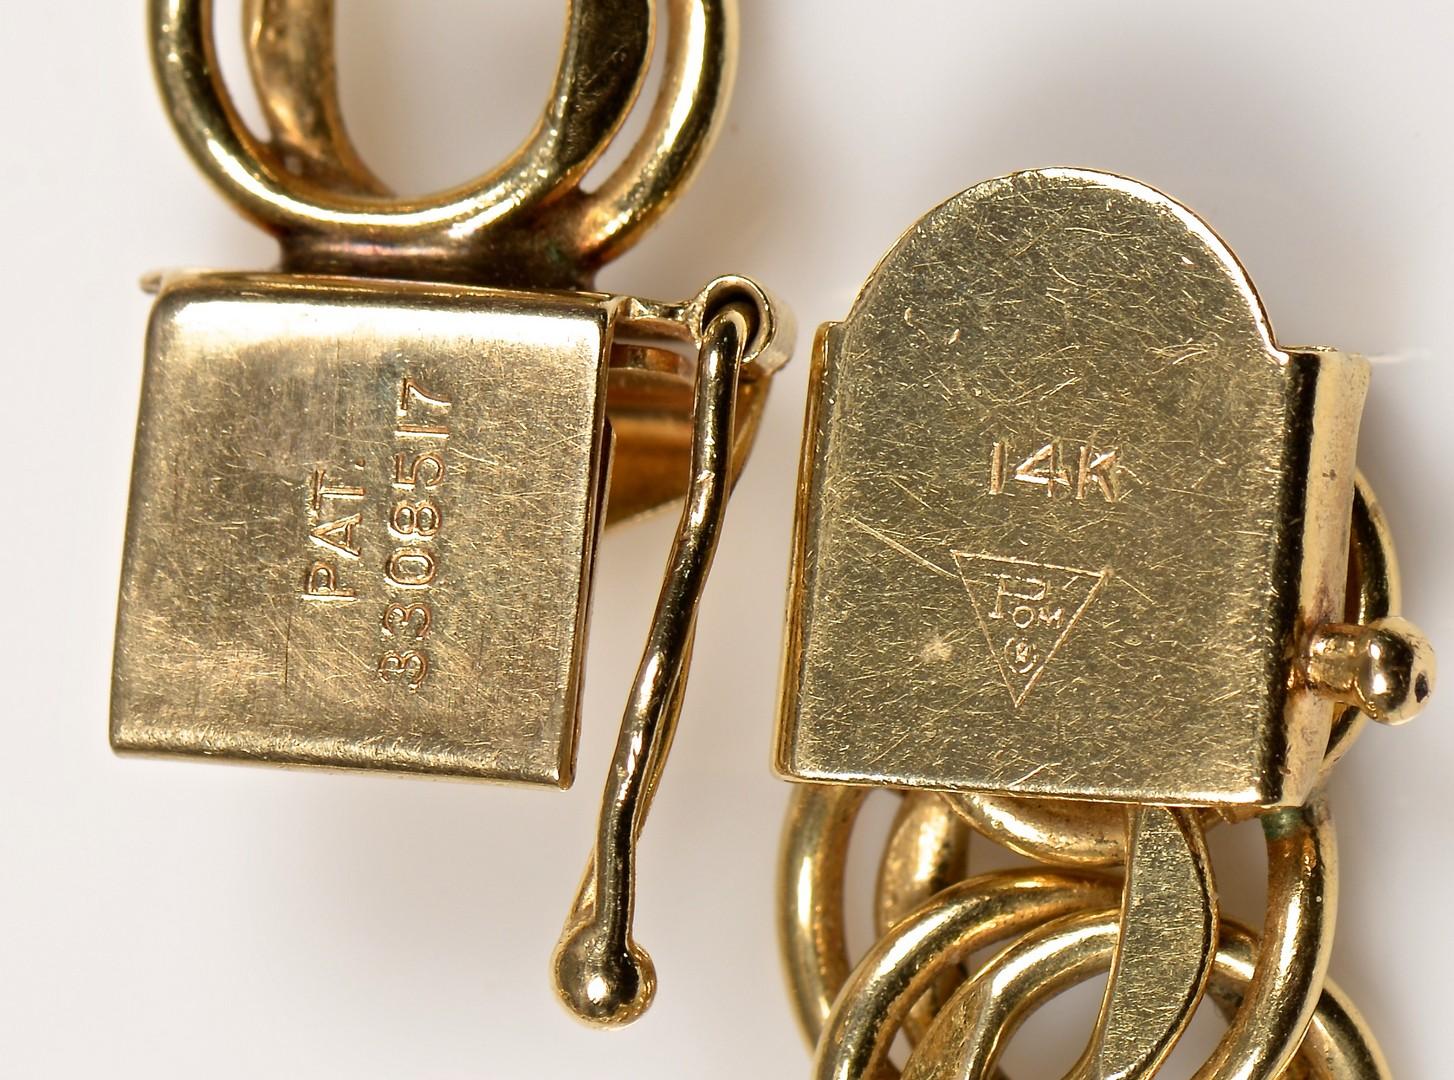 Lot 940: 14K Charm Bracelet w/ Heart Charm